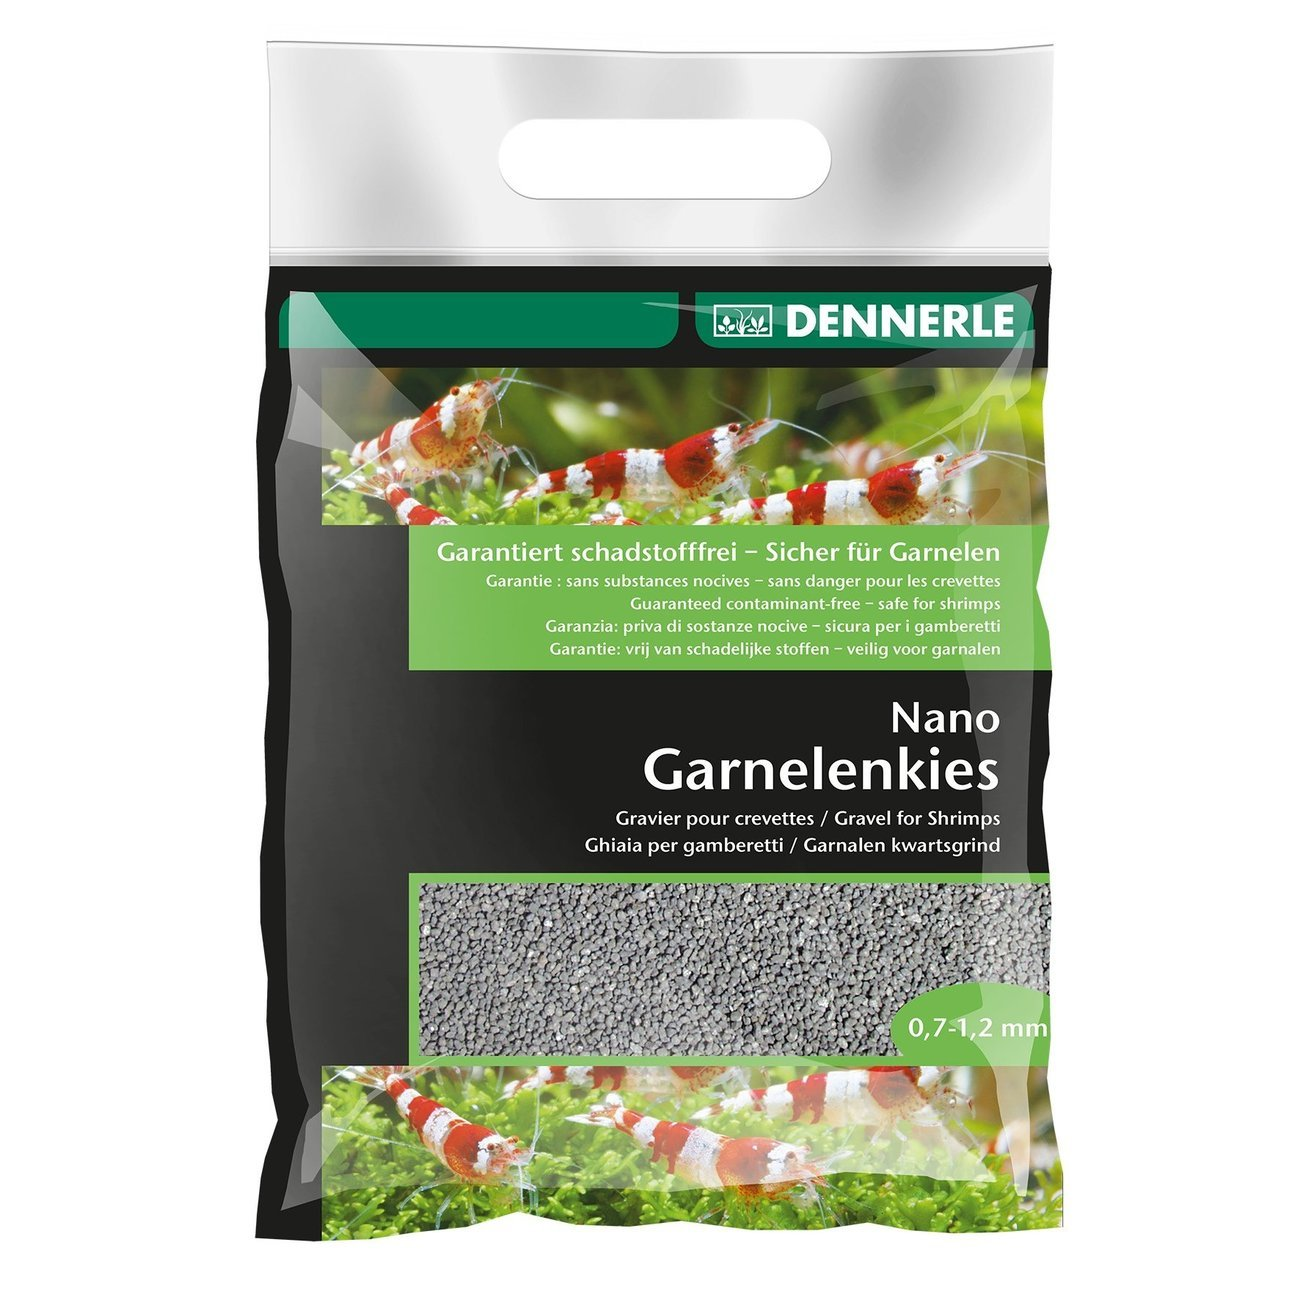 Dennerle Nano Garnelenkies Preview Image